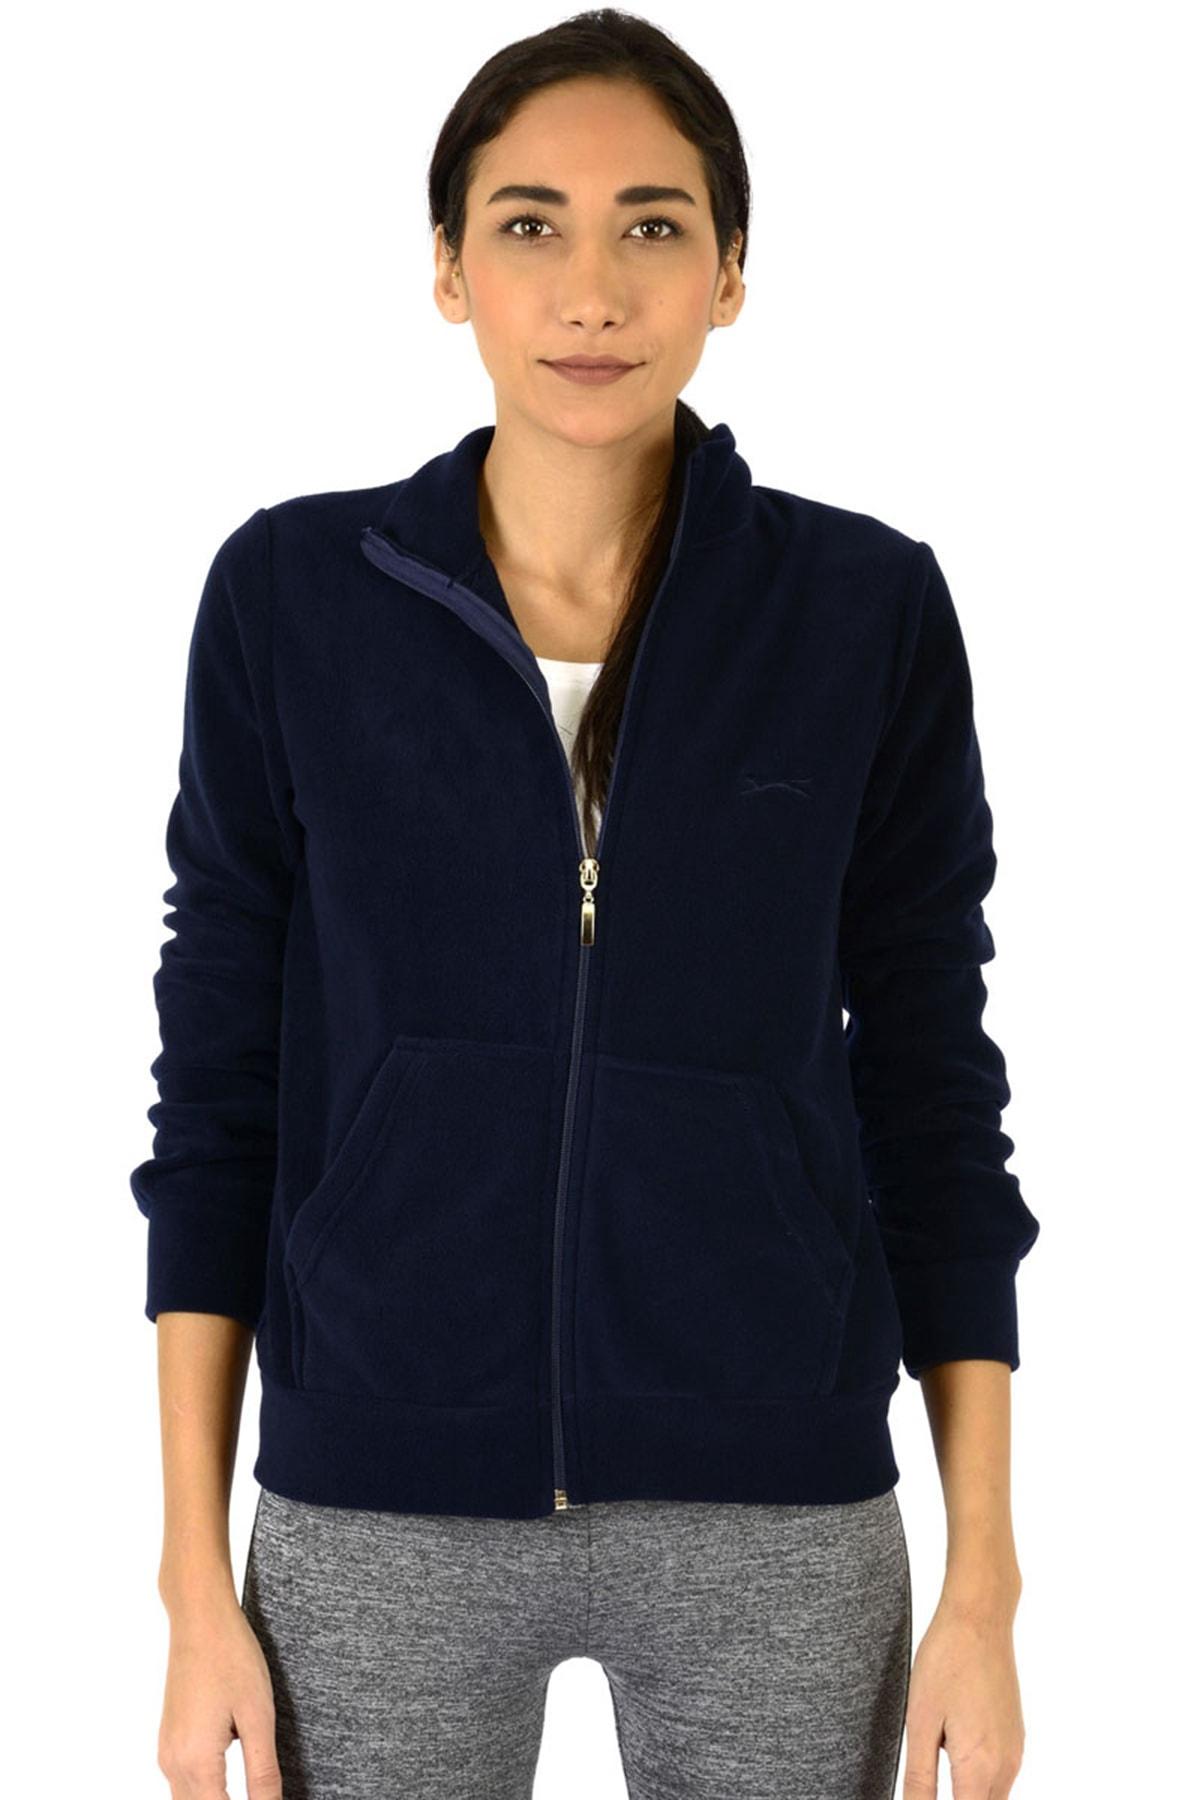 Slazenger Soul I Kadın Sweatshirt Lacivert 1